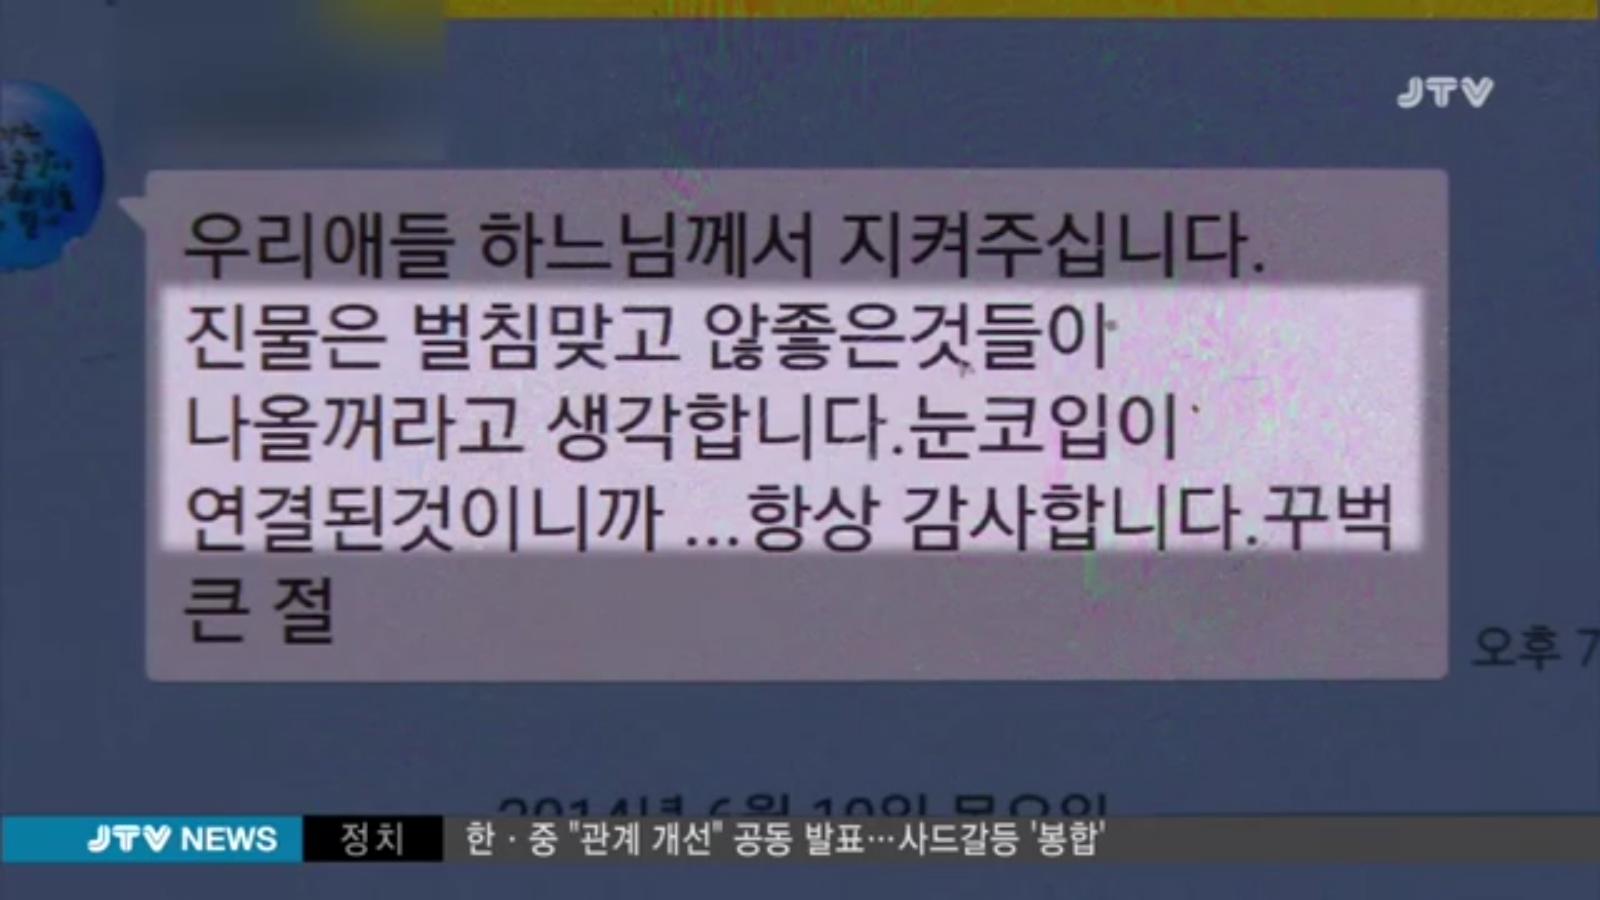 [17.10.31 JTV] 전주 봉침목사 아이에게 봉침 아동학대 논란, 지원금 회수해야2.jpg